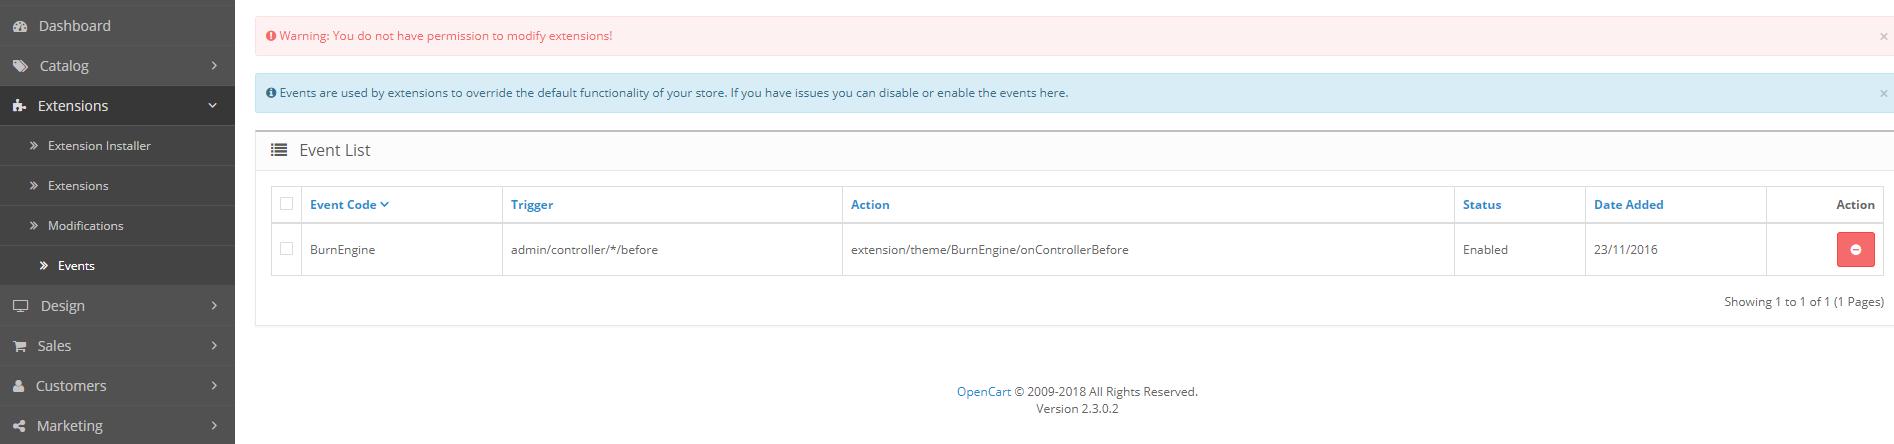 Permission Denied opencart 2 3 0 2 - OpenCart Community